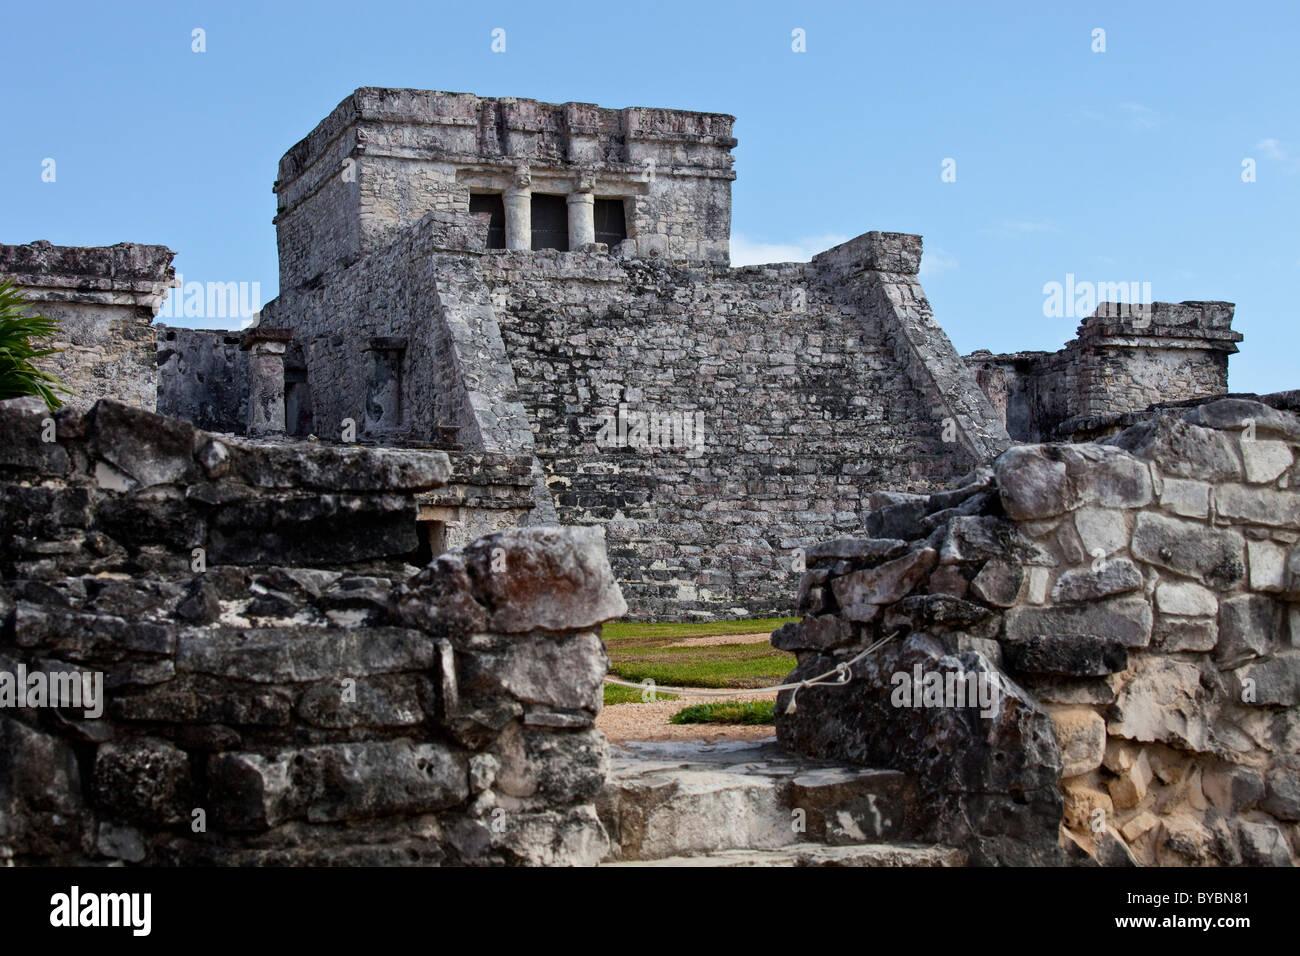 Tulum, Mayan ruins on the Yucatan Peninsula, Mexico - Stock Image